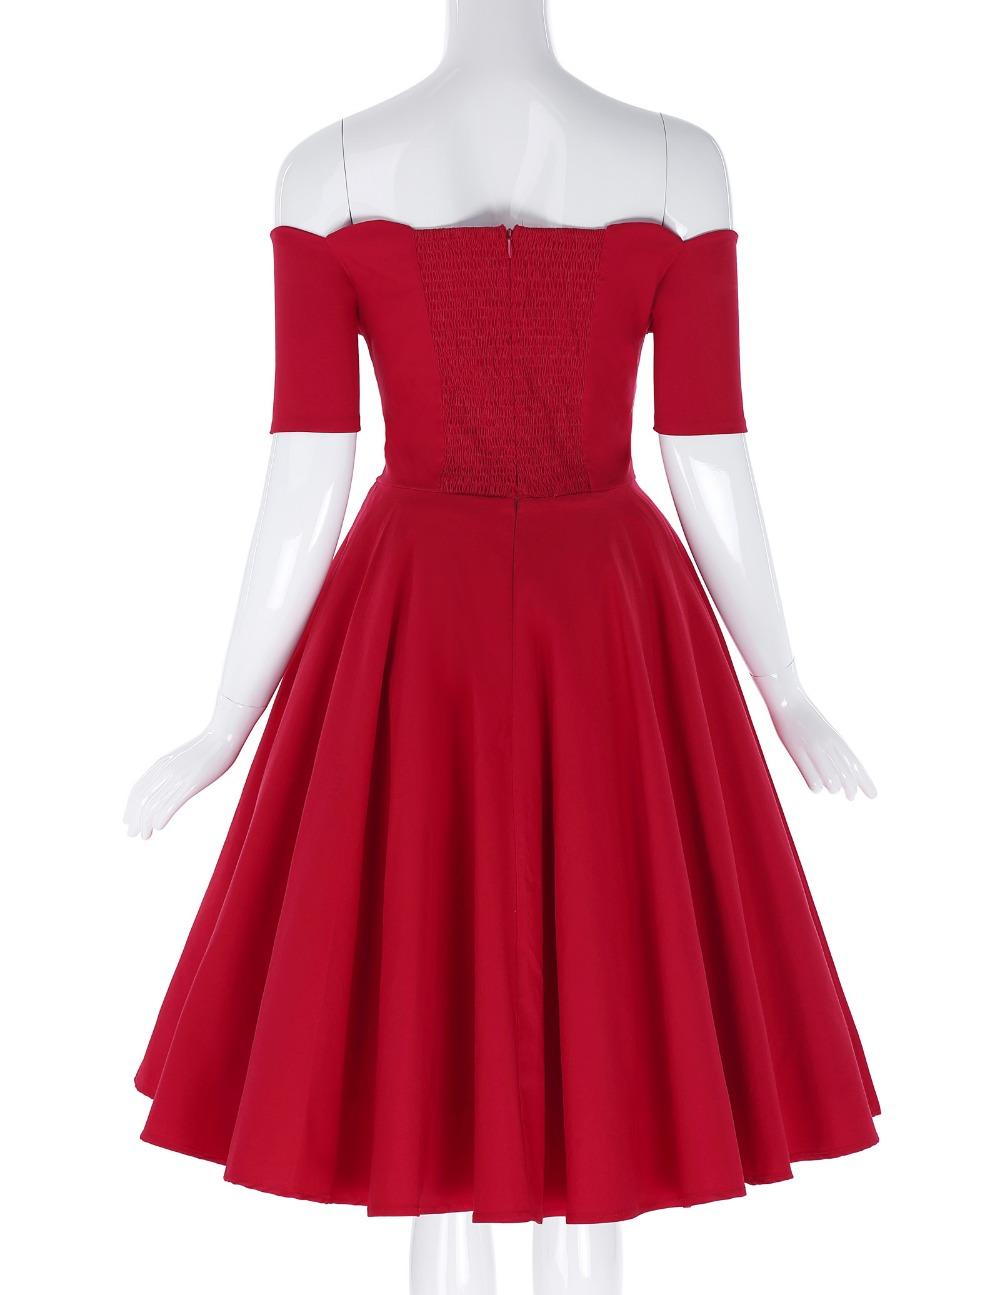 Belle Poque 17 Women Dress Robe Vintage Off Shoulder Black Summer Dress Jurken 1950s 60s Retro Rockabilly Swing Party Dresses 19